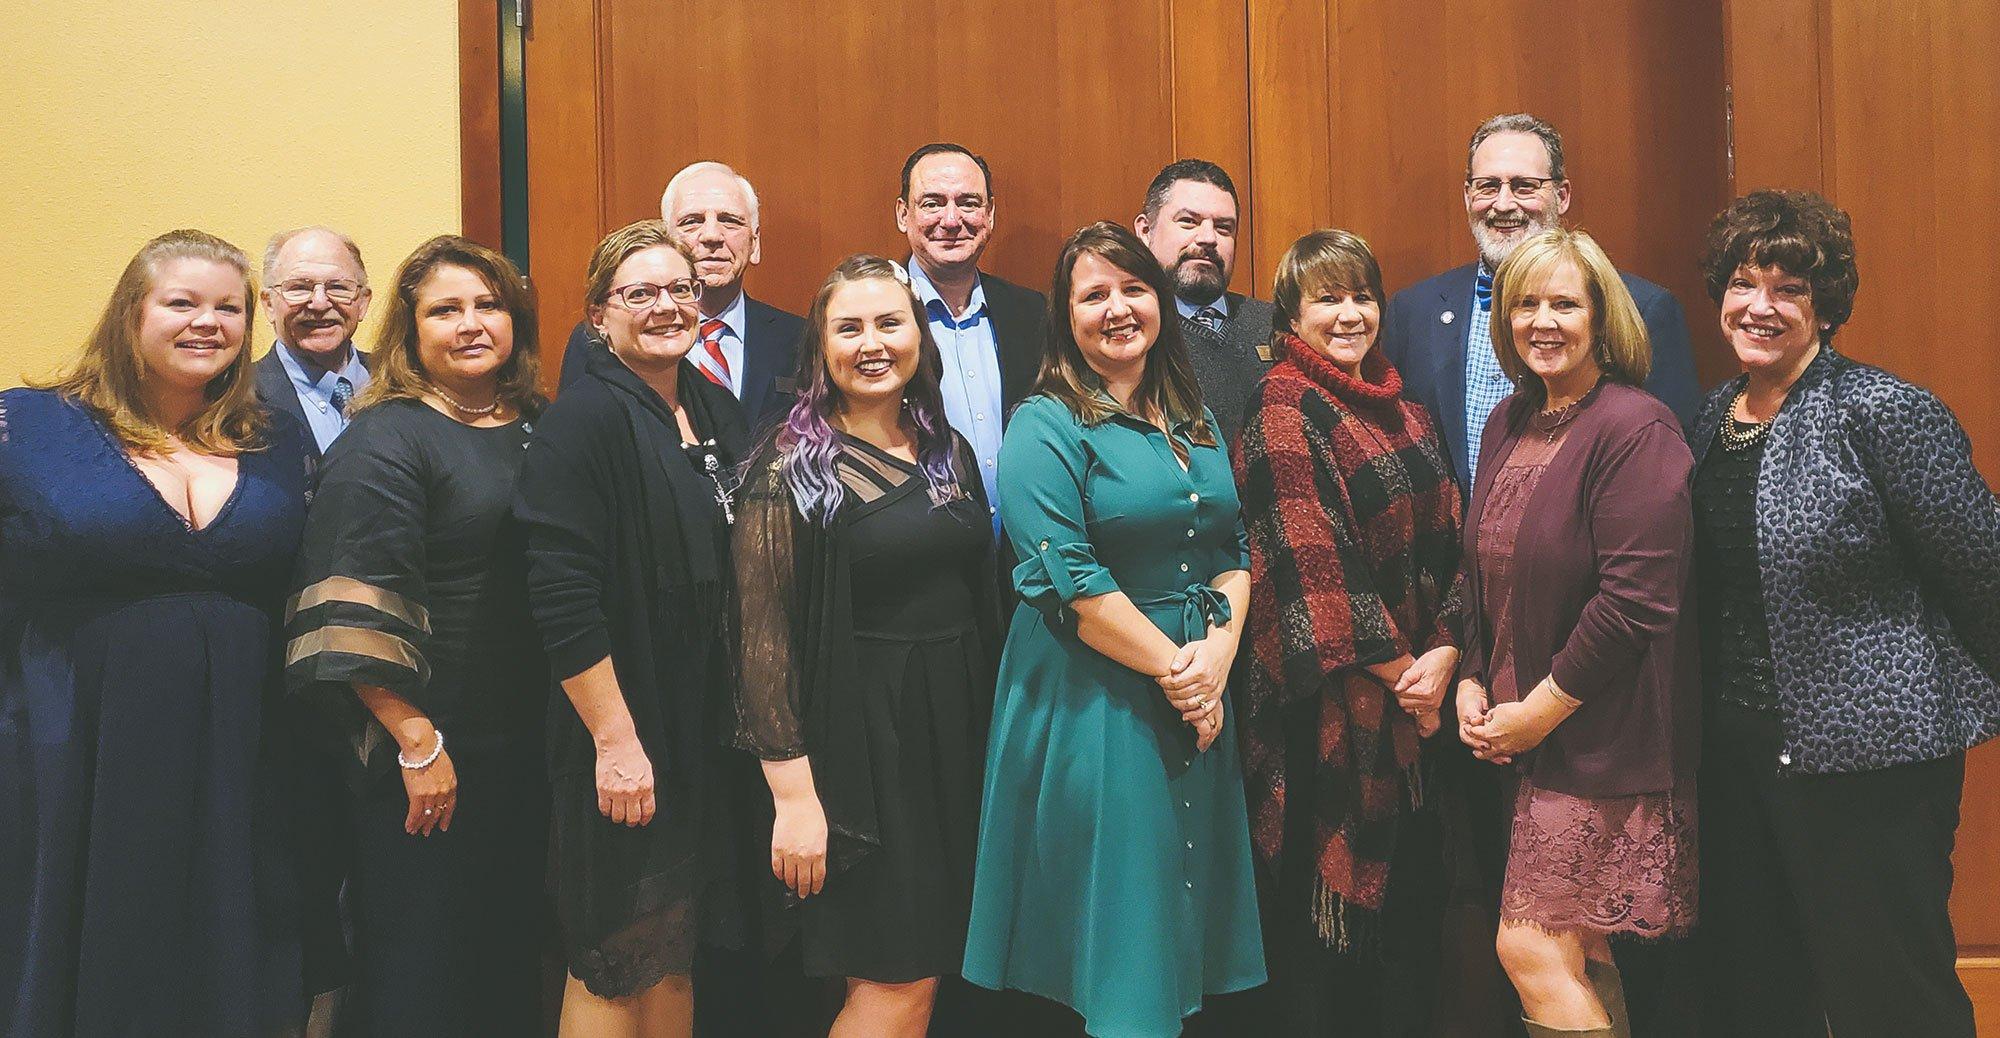 Crescent City - Del Norte County Chamber of Commerce Board of Directors